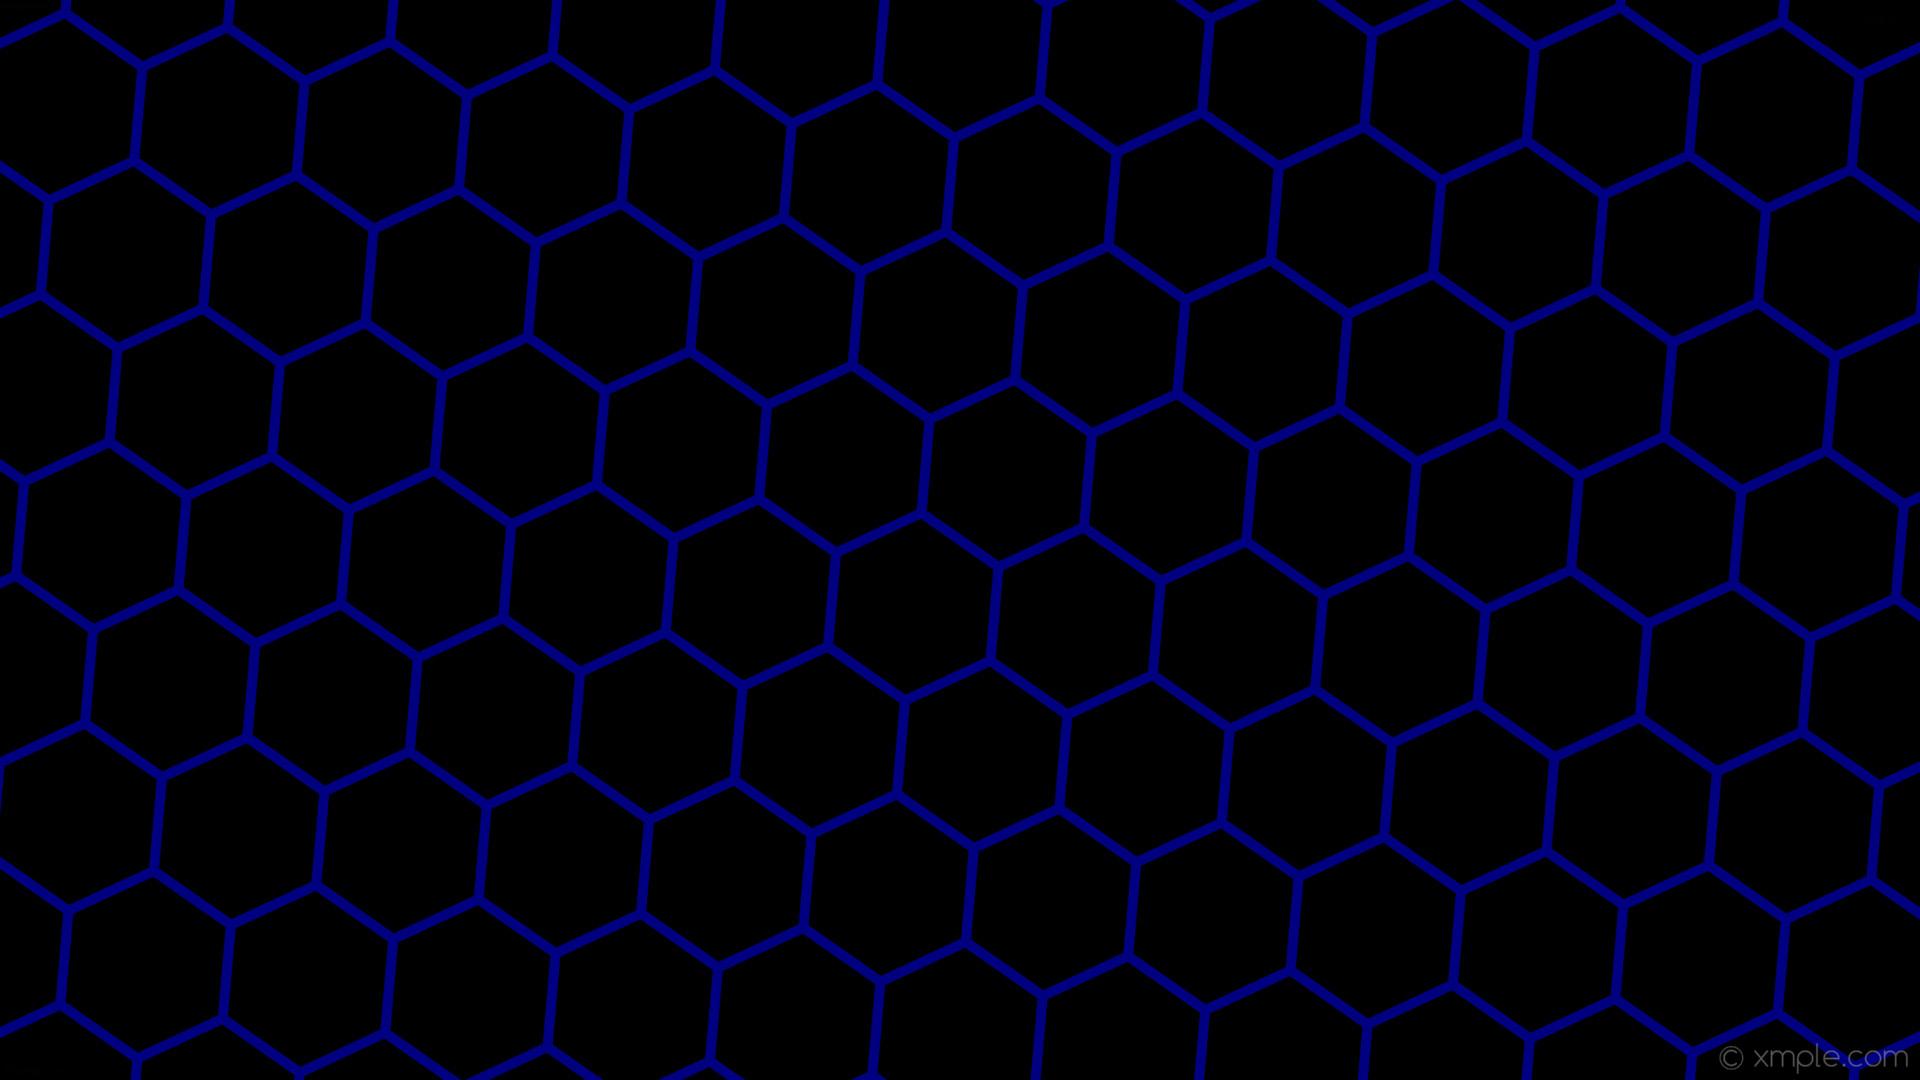 wallpaper beehive blue black hexagon honeycomb navy #000000 #000080  diagonal 55° 10px 163px